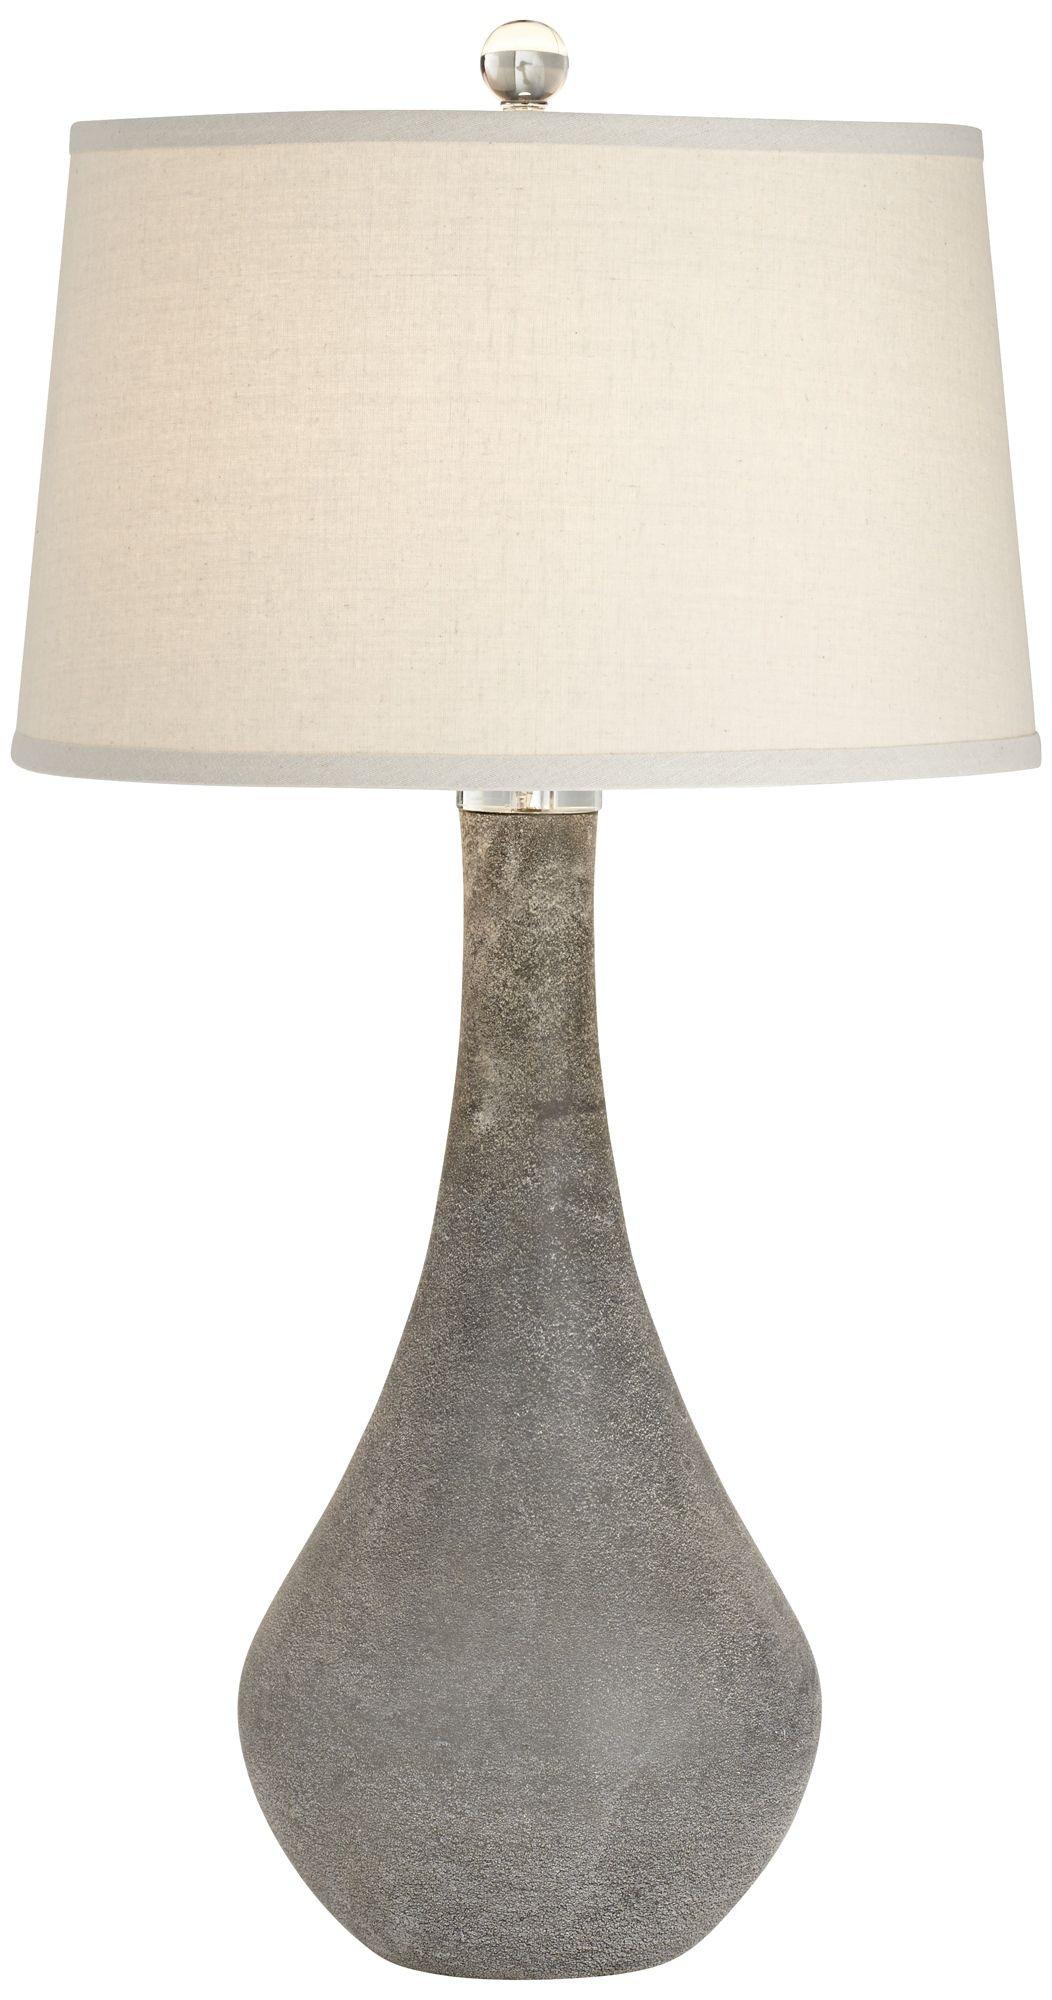 hayneedle coast com pin table lamp pacific gala glass light lighting from